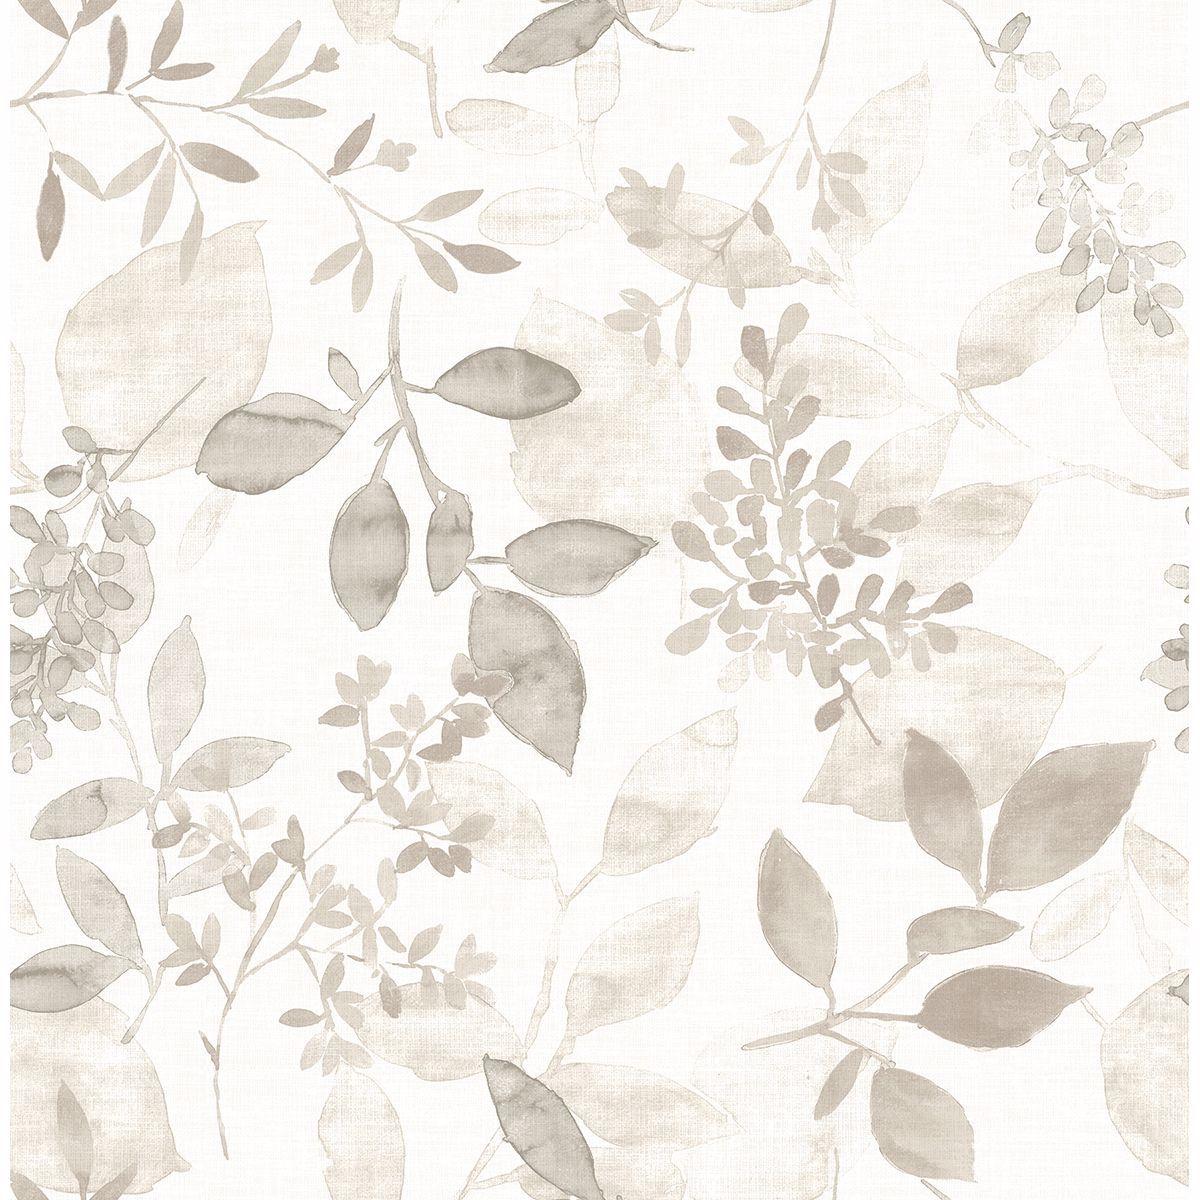 Gossamer Taupe Botanical Wallpaper Botanical Wallpaper Watercolor Wallpaper Farmhouse Wallpaper